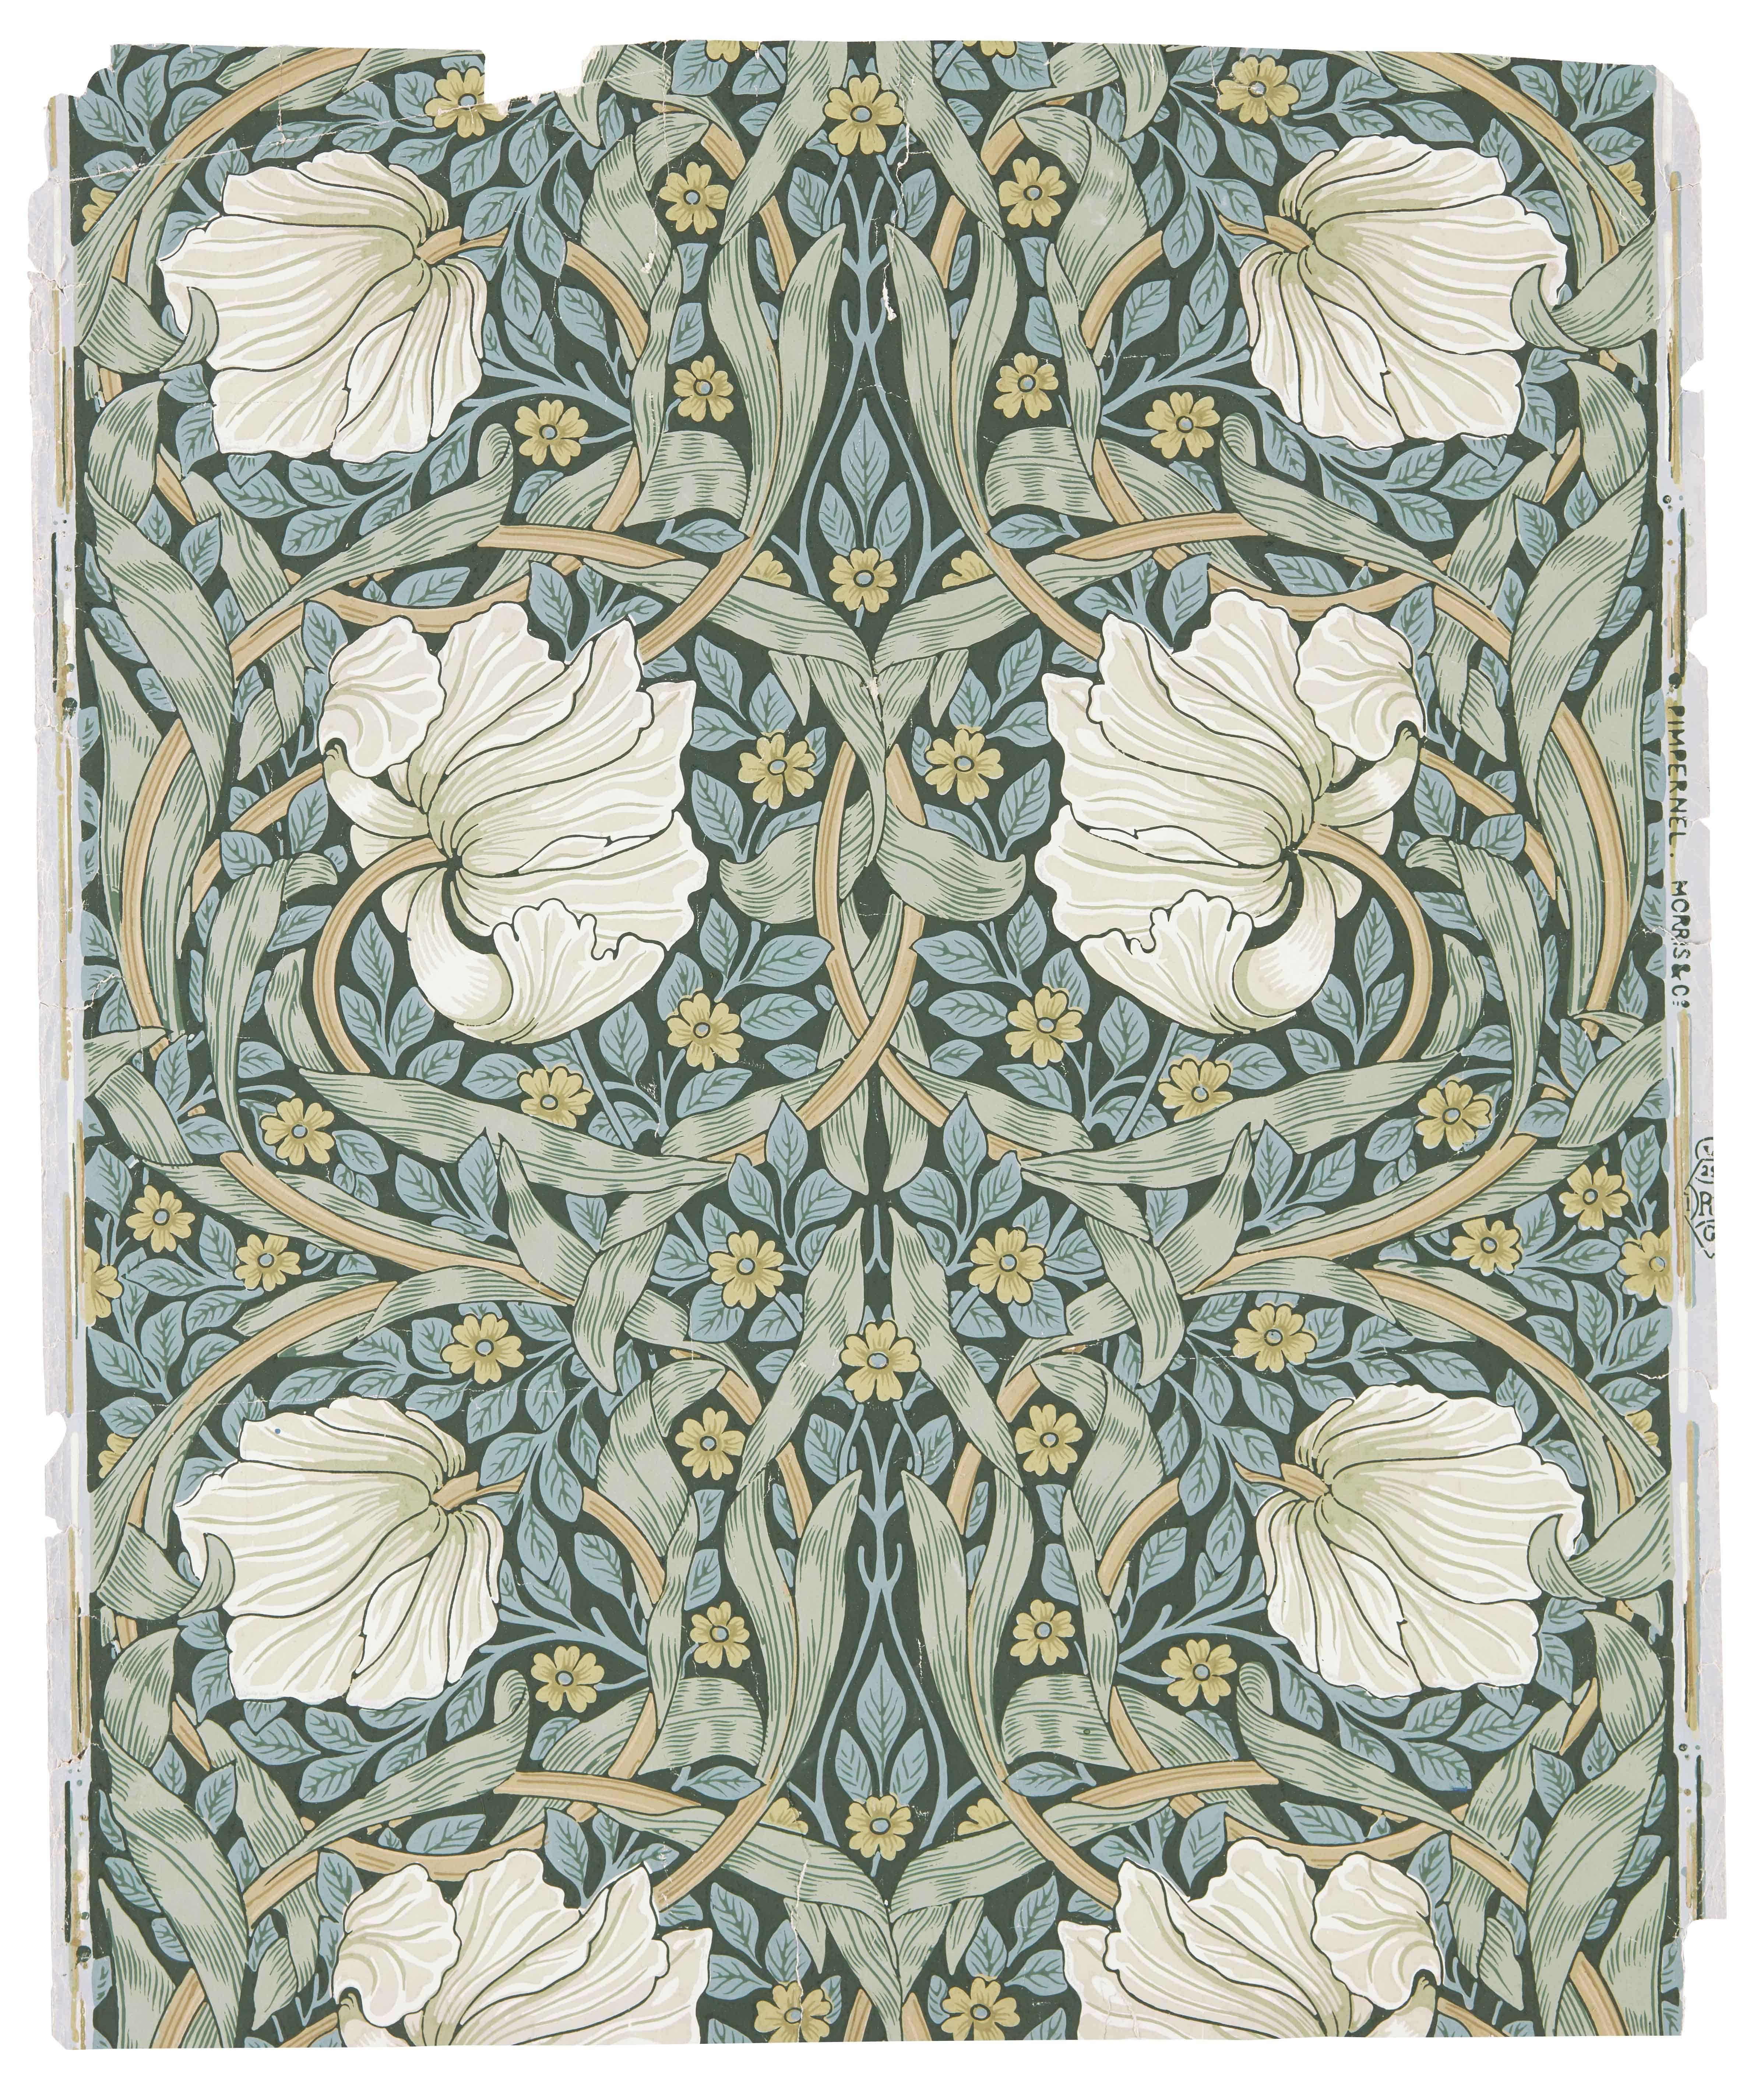 Morris Co Gancedo William Morris Flores Wallpaper Arte De La Pared De Mosaico